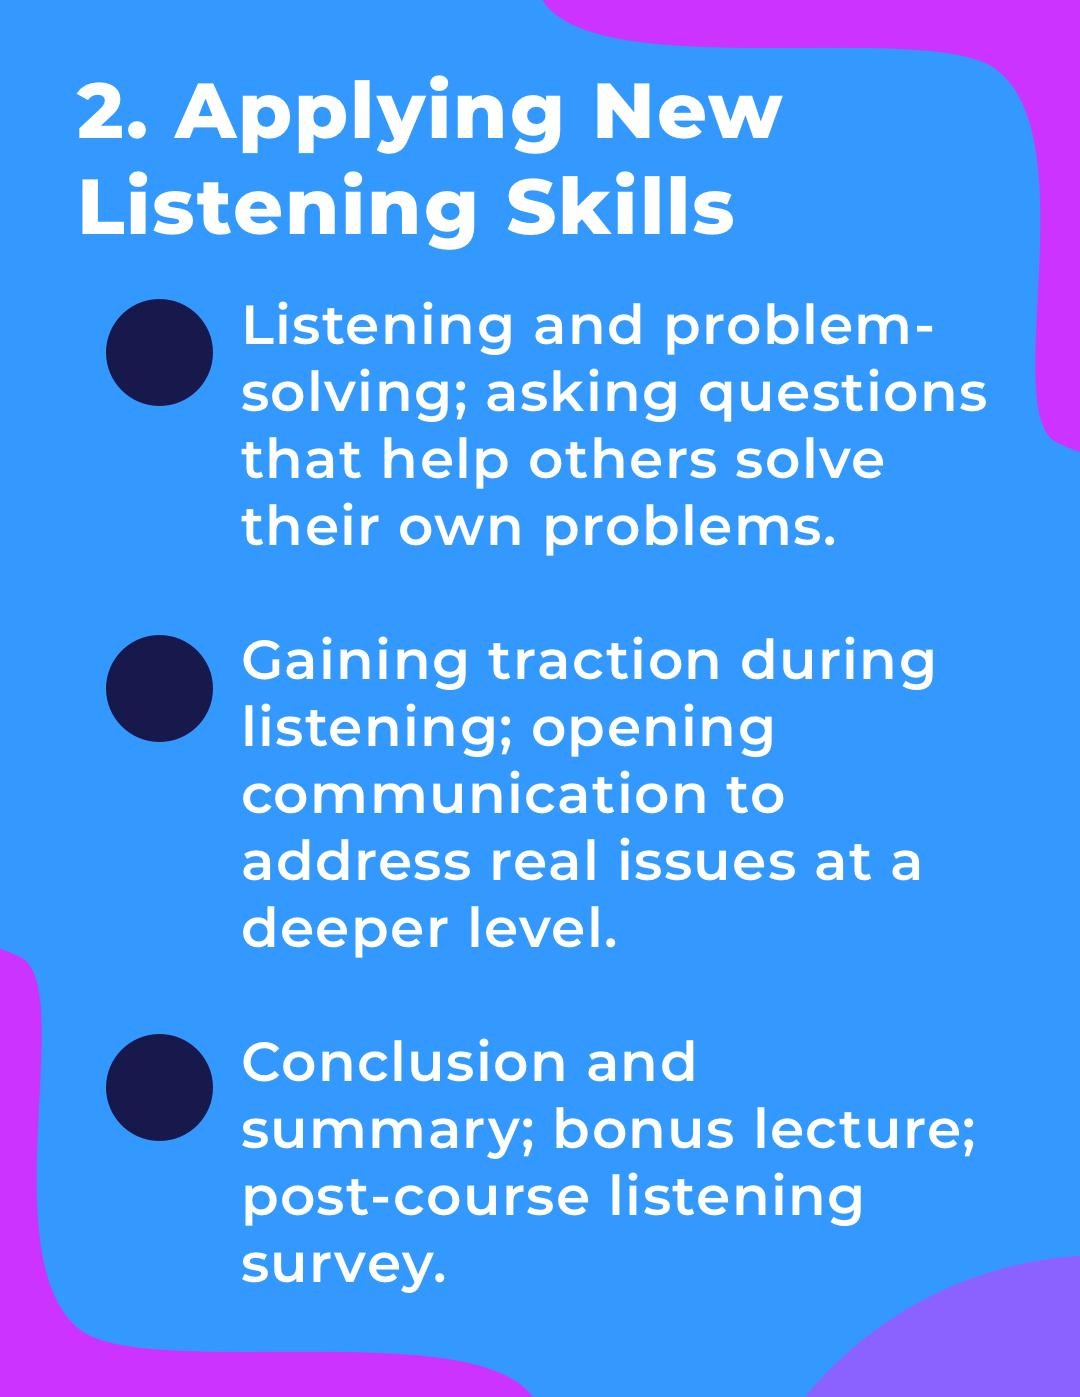 Applying New Listening Skills